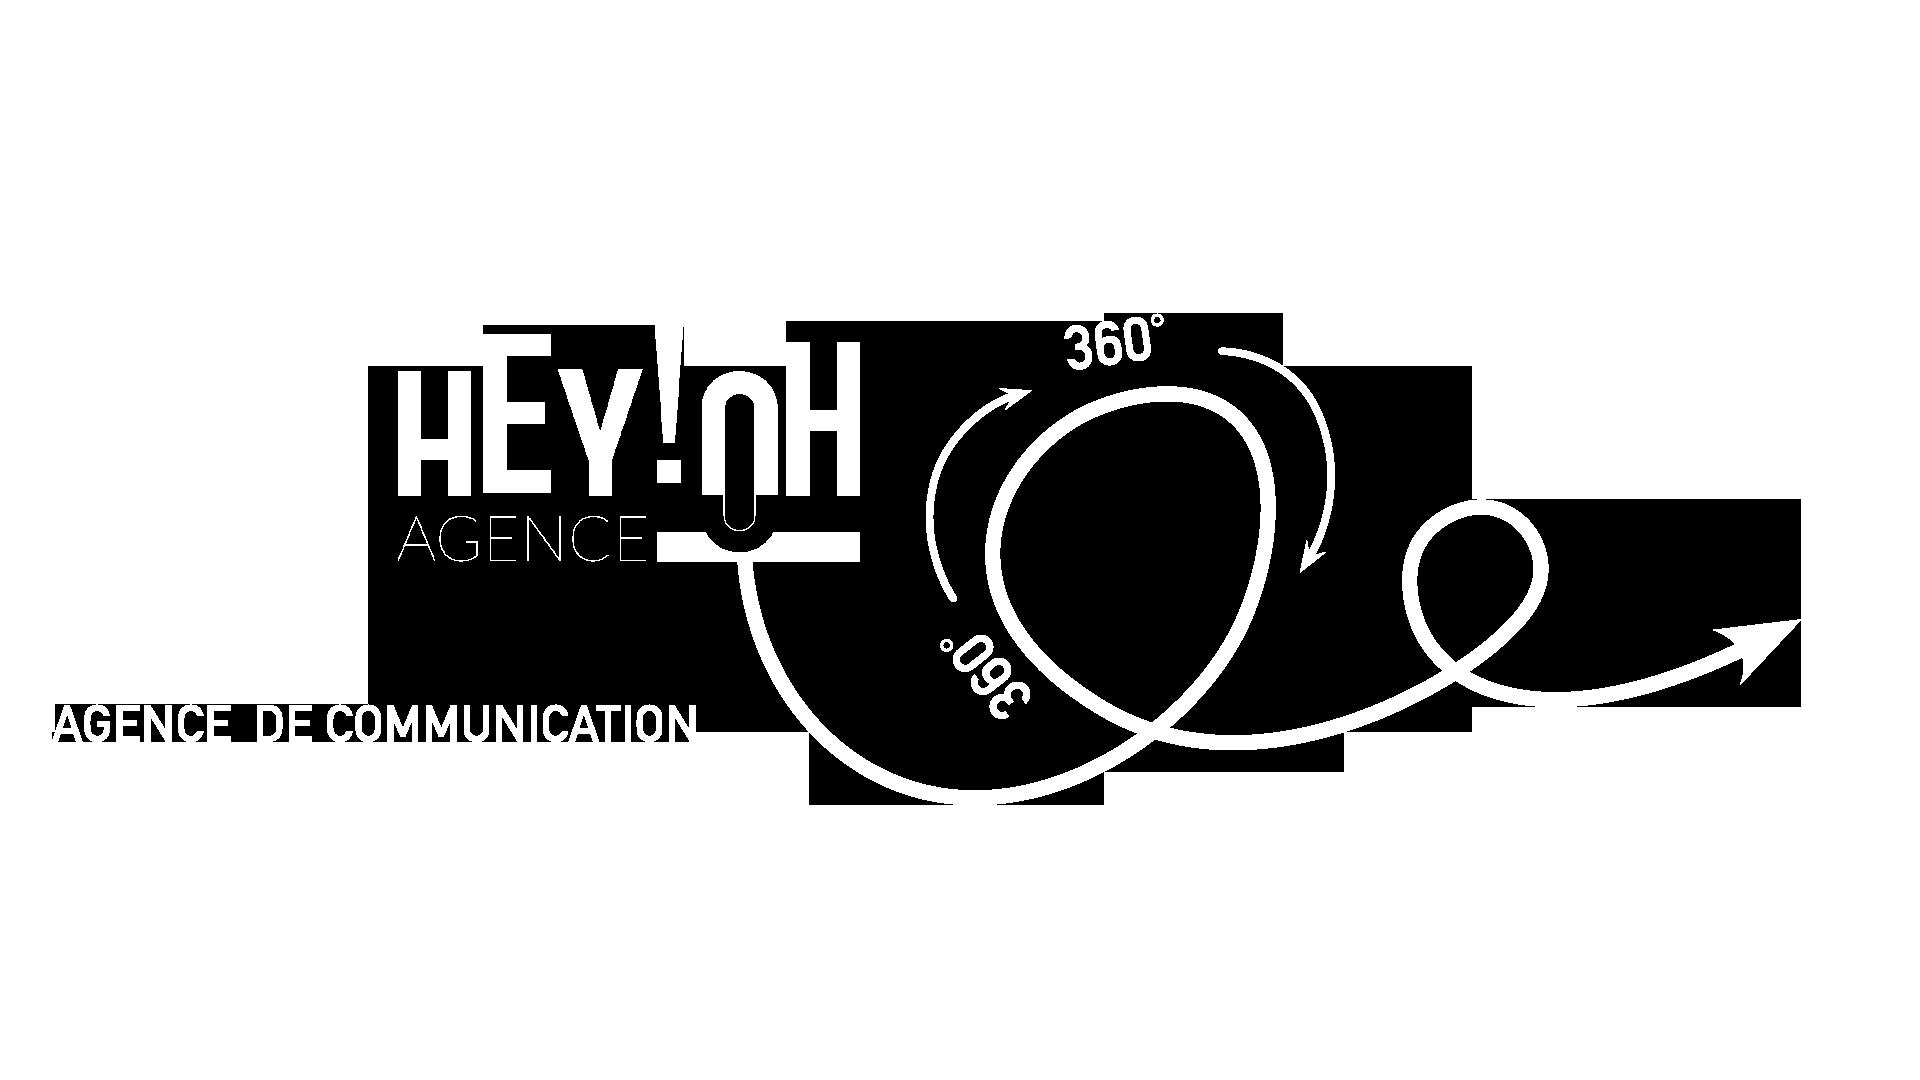 Heyoh agence de communication lyon